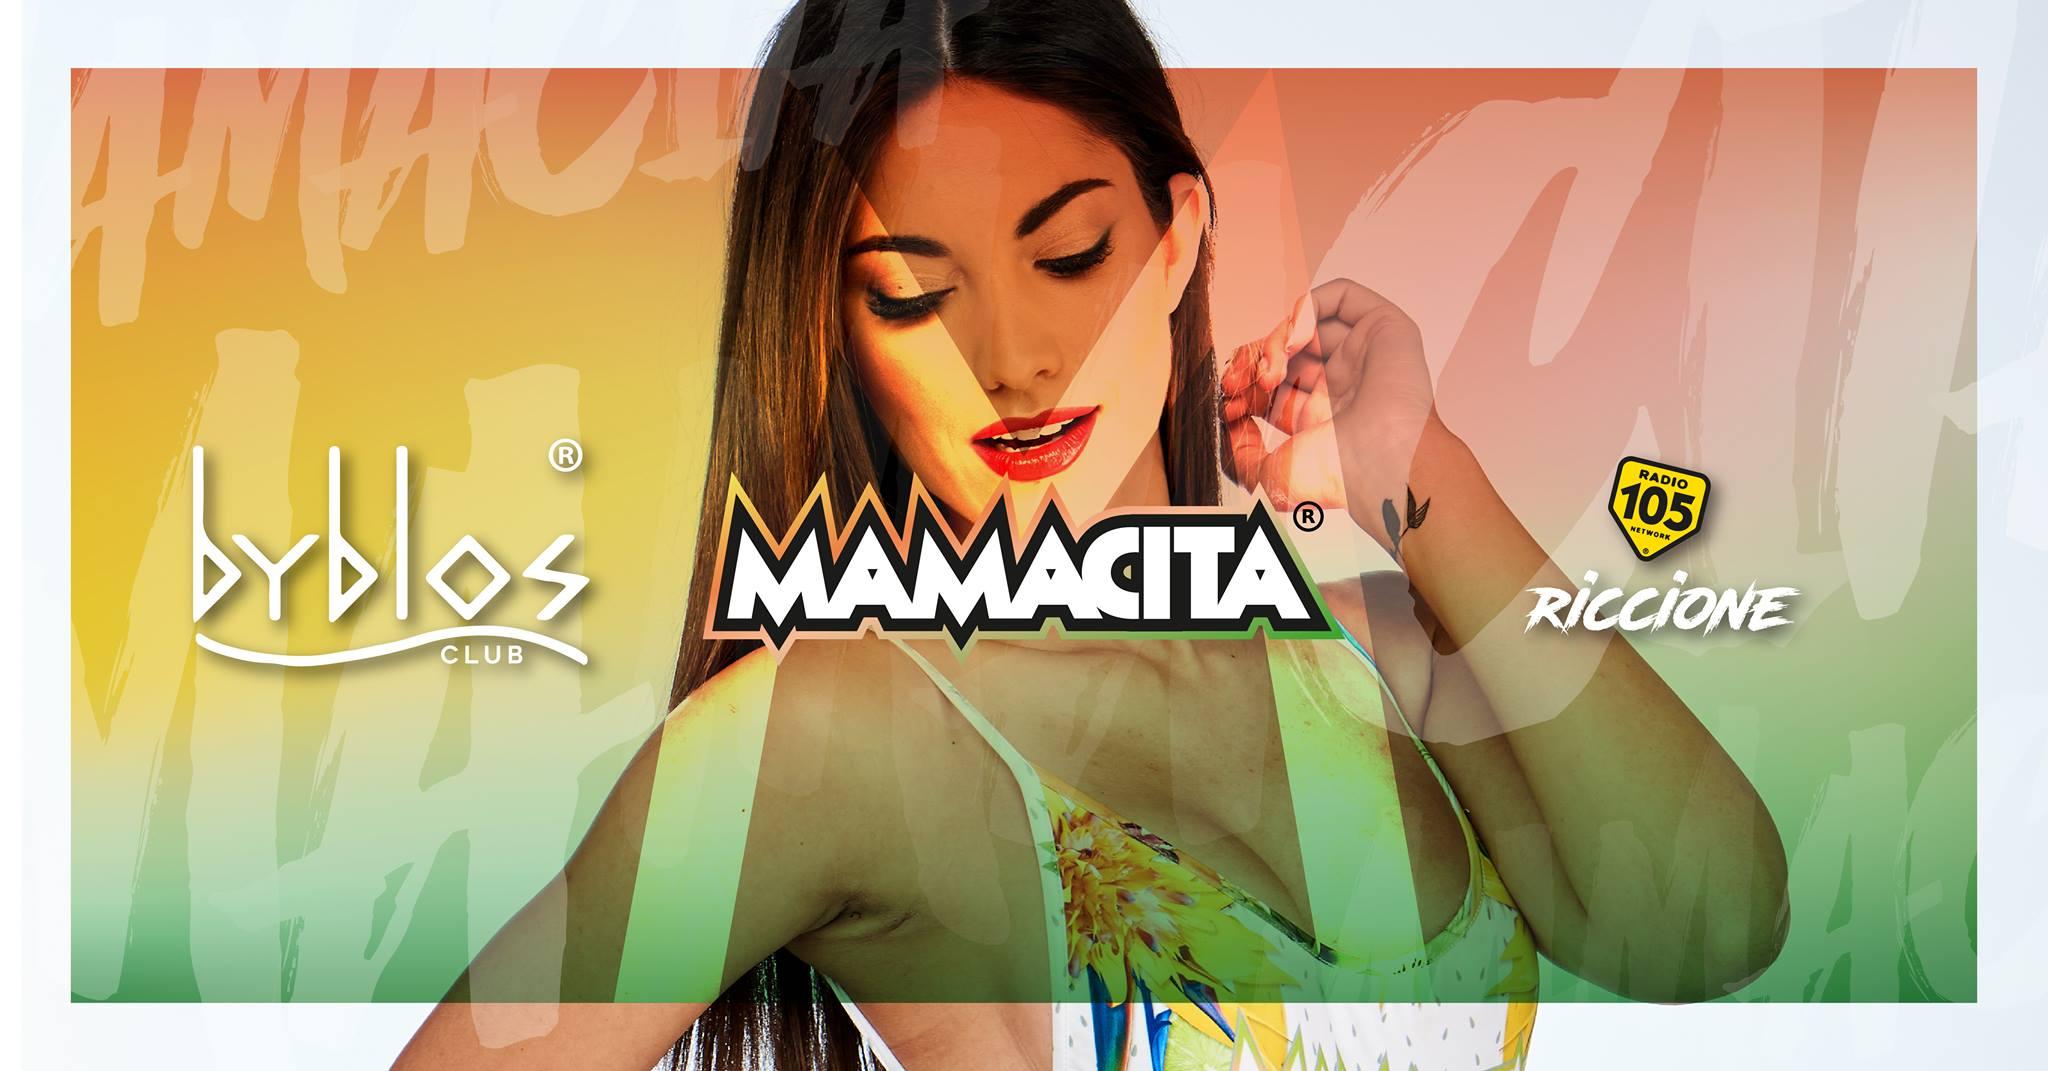 Mamacita – Byblos Club – Riccione – 31 Luglio 2018